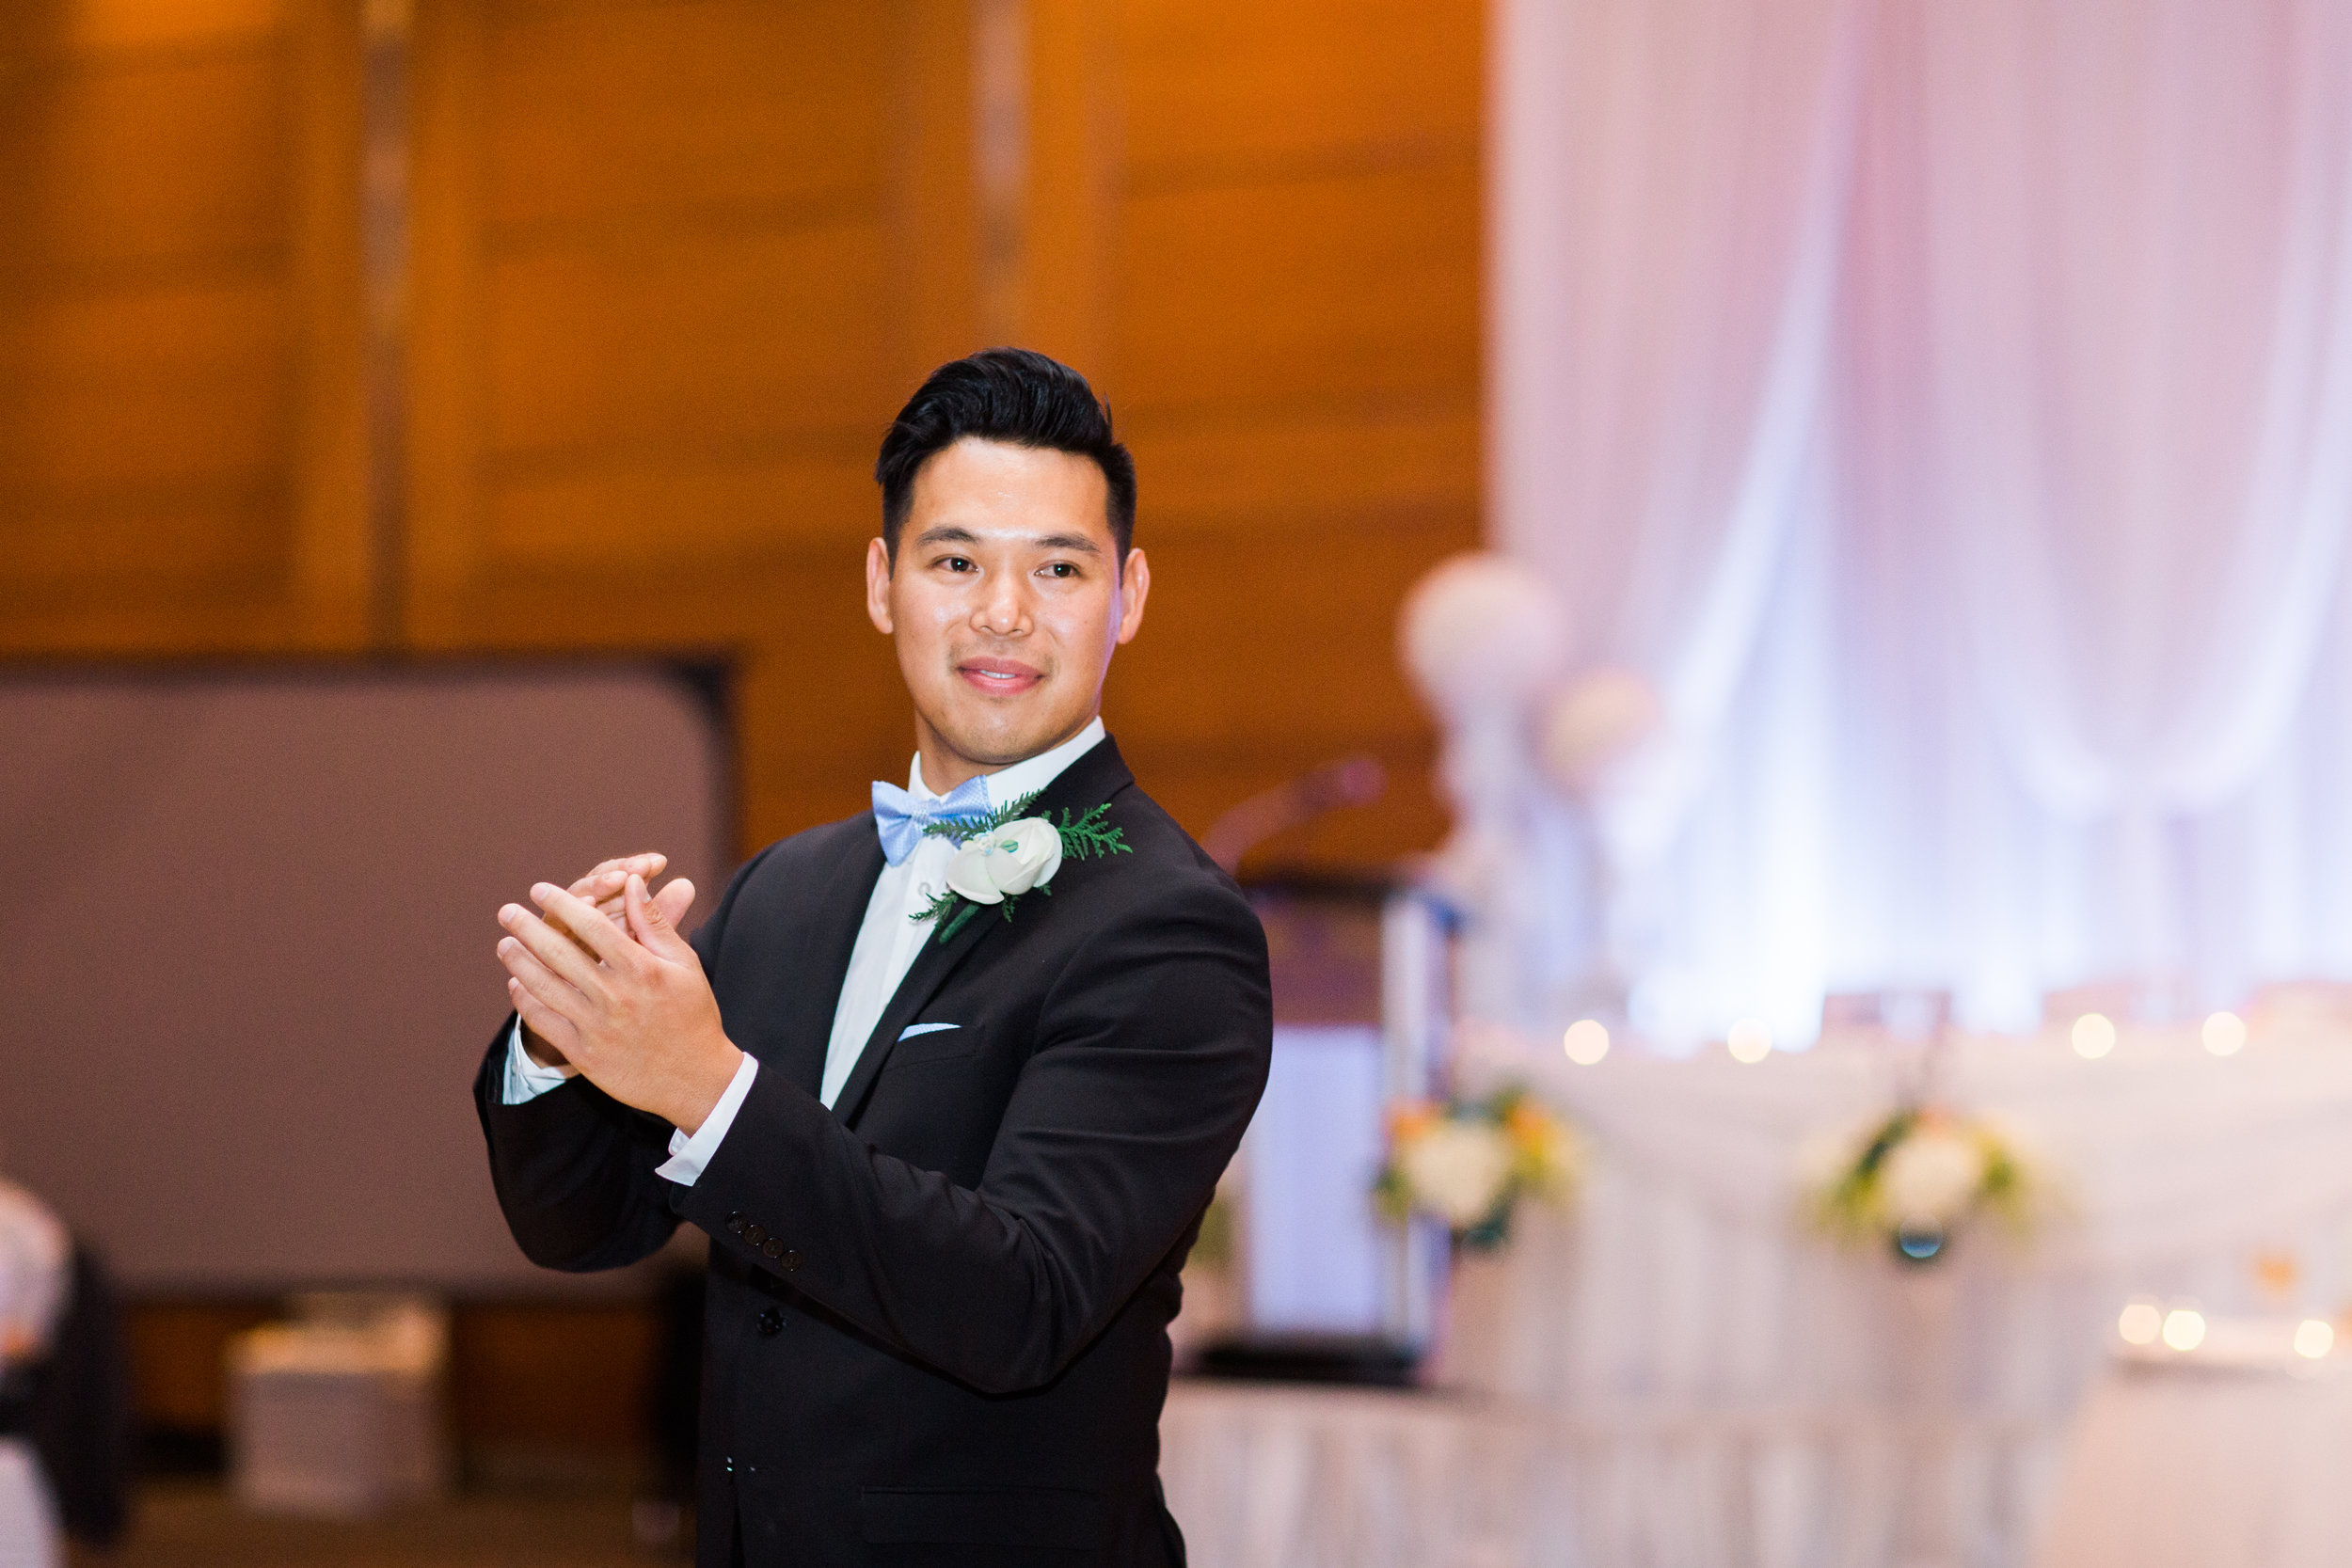 Toronto Fine Art Photographer - Hilton Markham Wedding - Reception-19.jpg